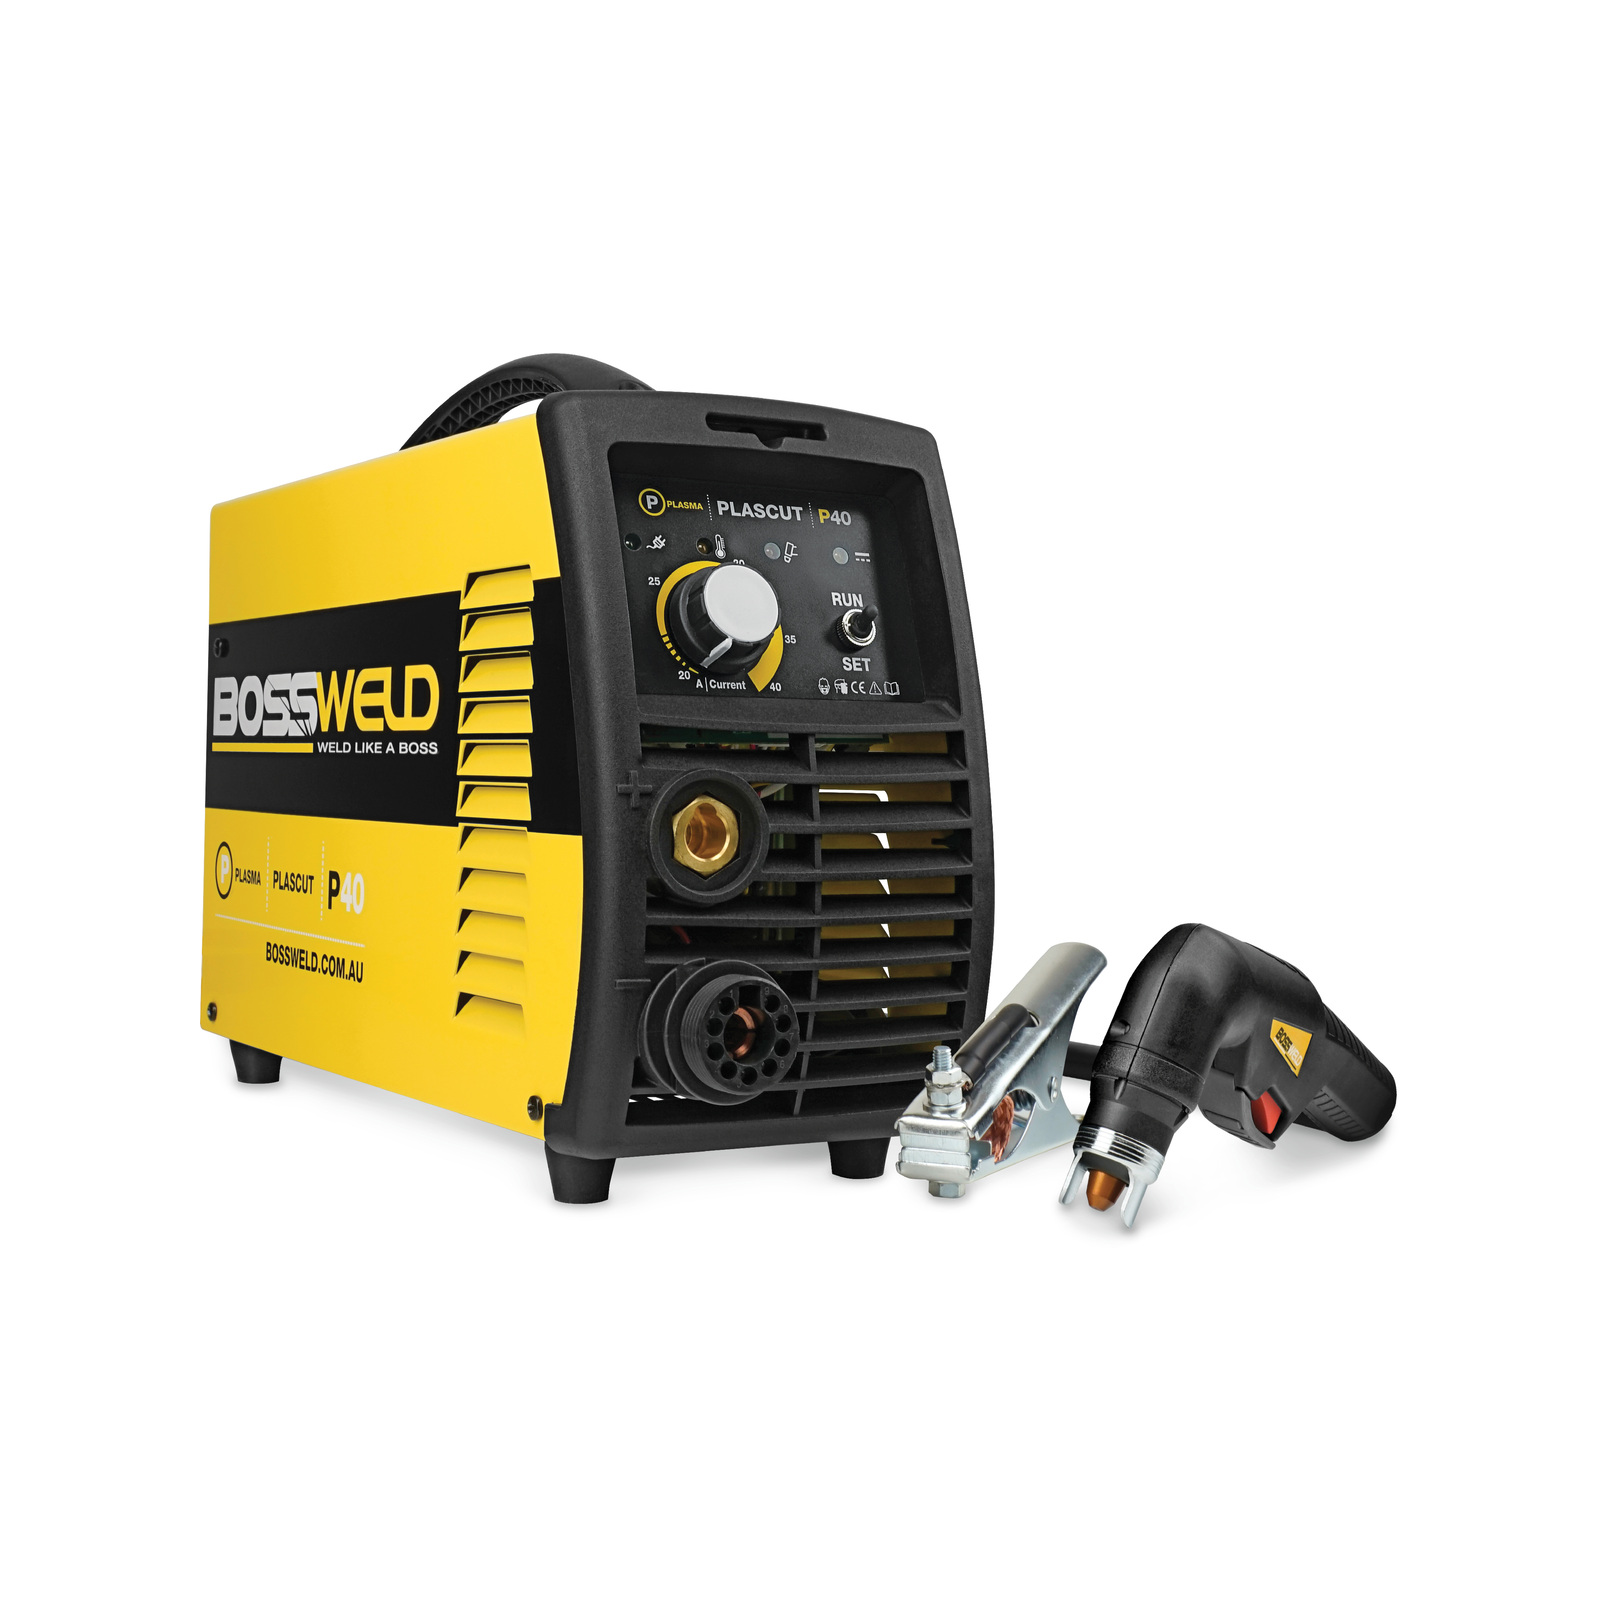 Bossweld 40 Amp P40 Plasma Cutter Inverter